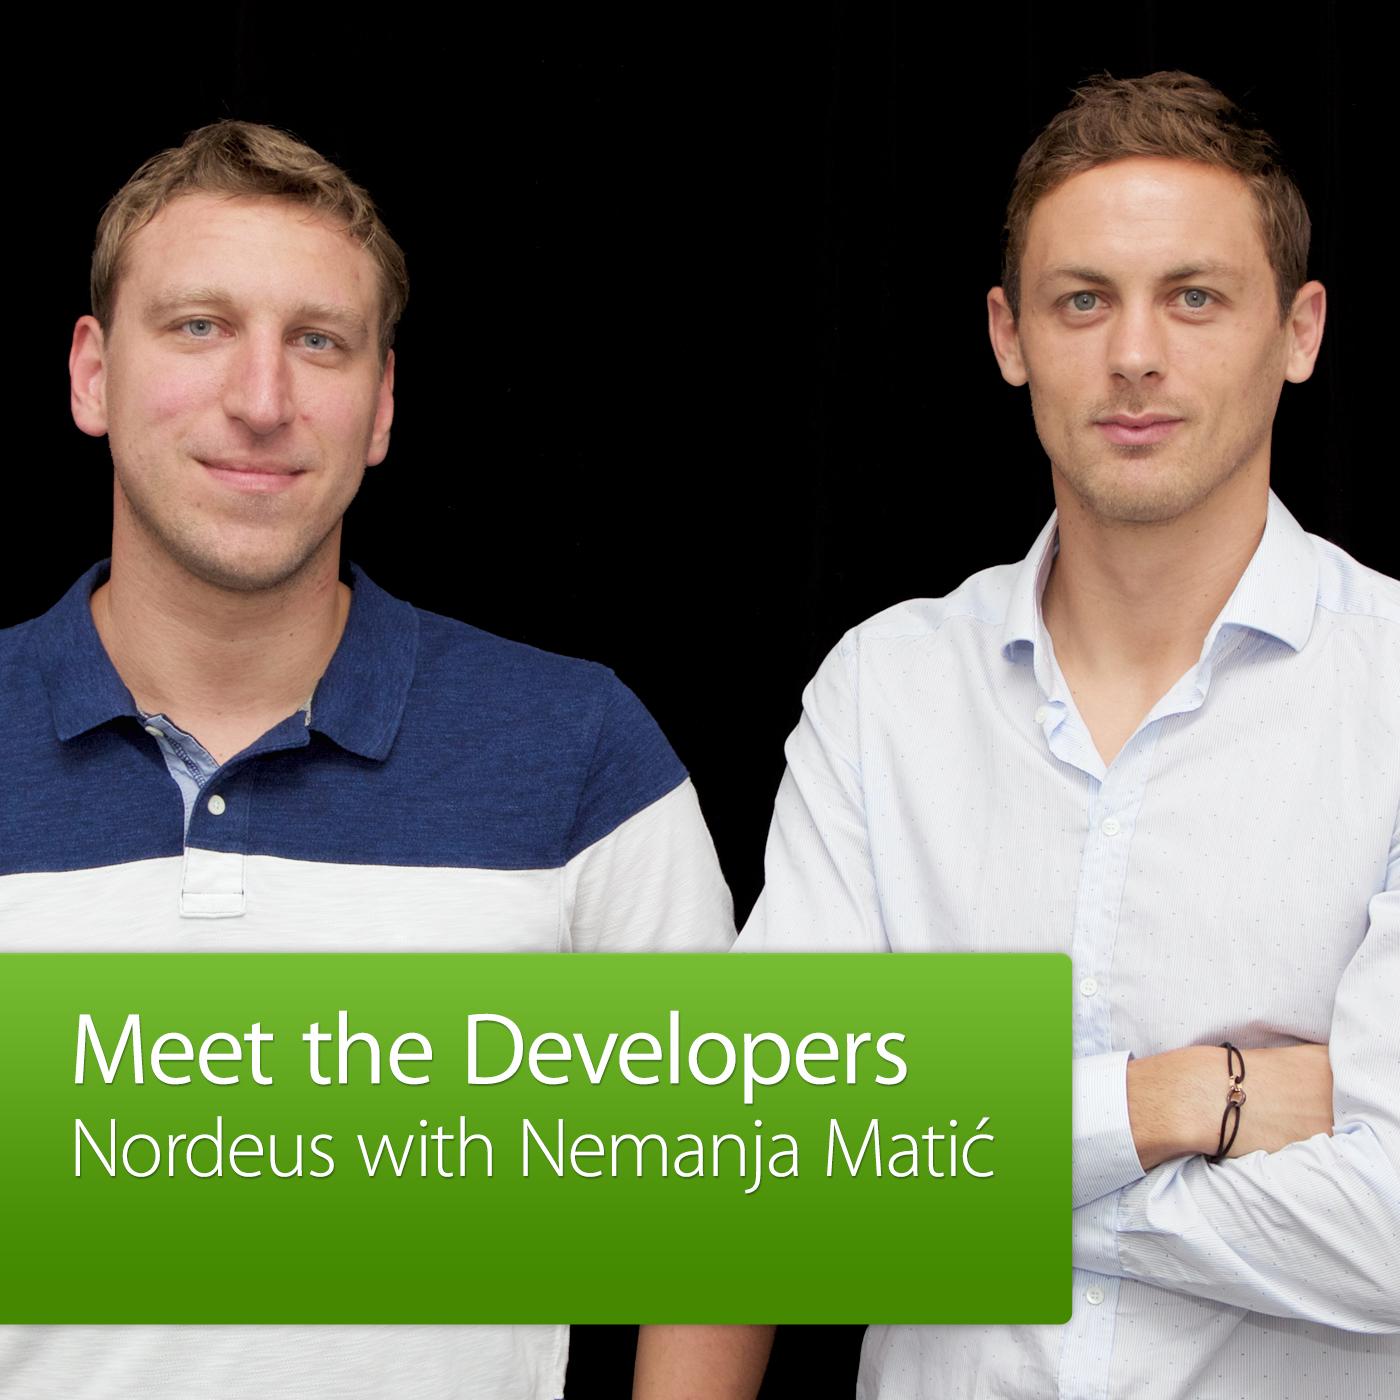 Nordeus with Nemanja Matić: Meet the Developers